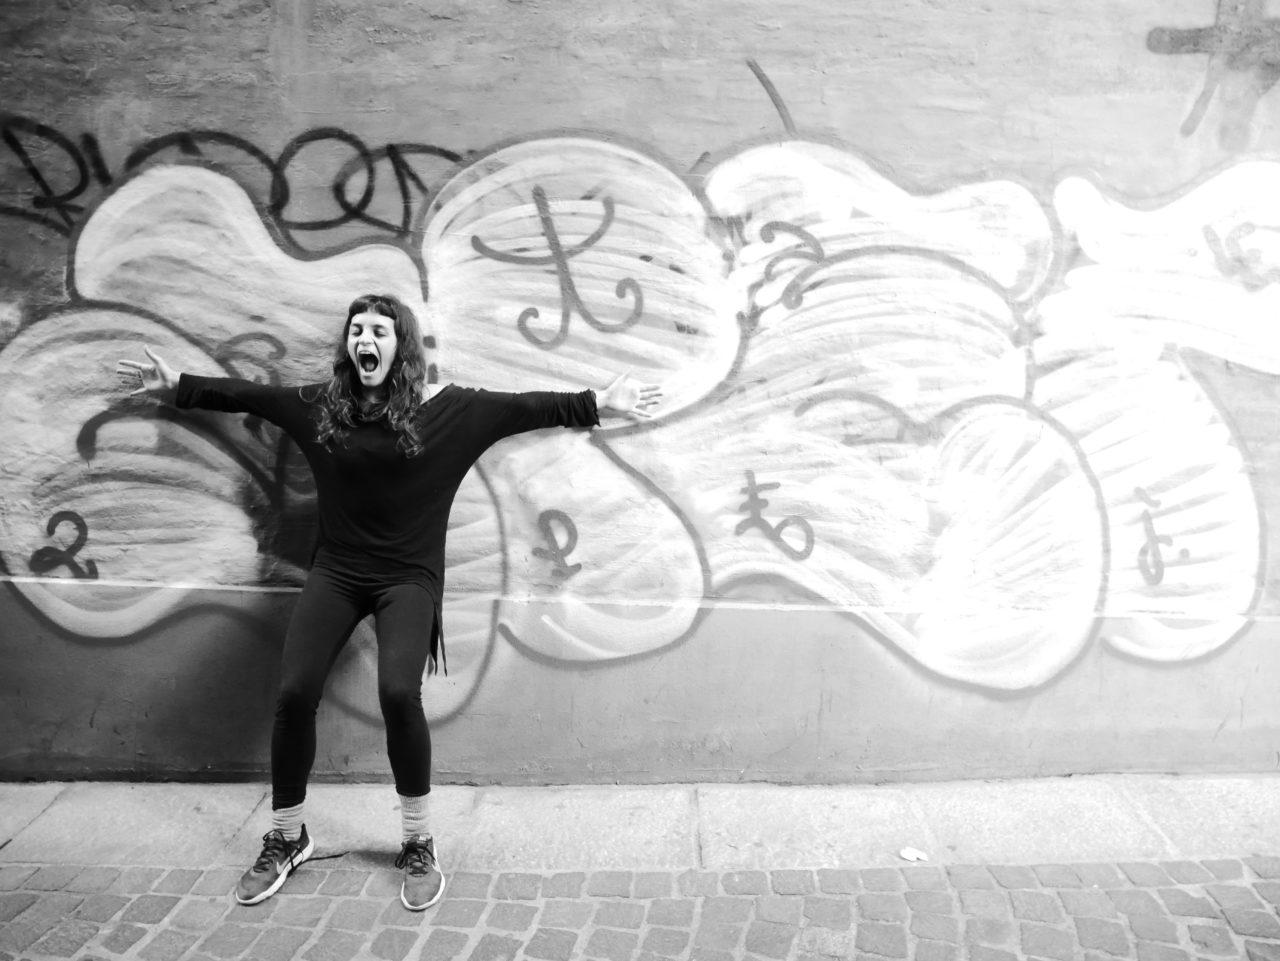 Andrea-Montevecchi_urban-dance-training-1280x961.jpg